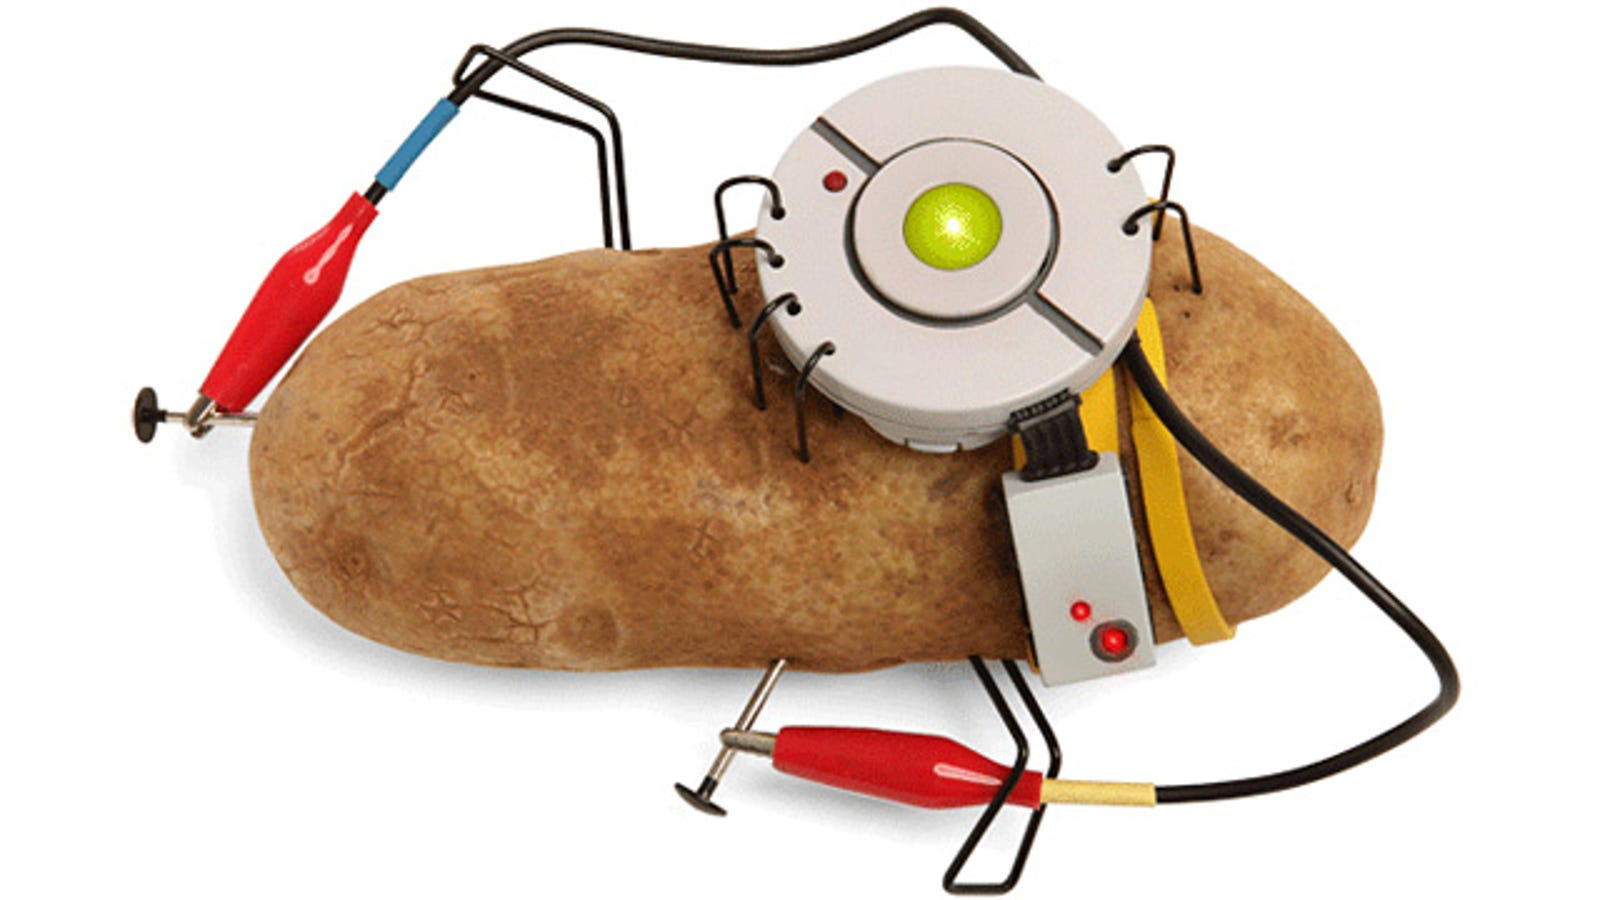 PotatOS Kit Turns a Portal 2 Gag Into a Science Fair Project